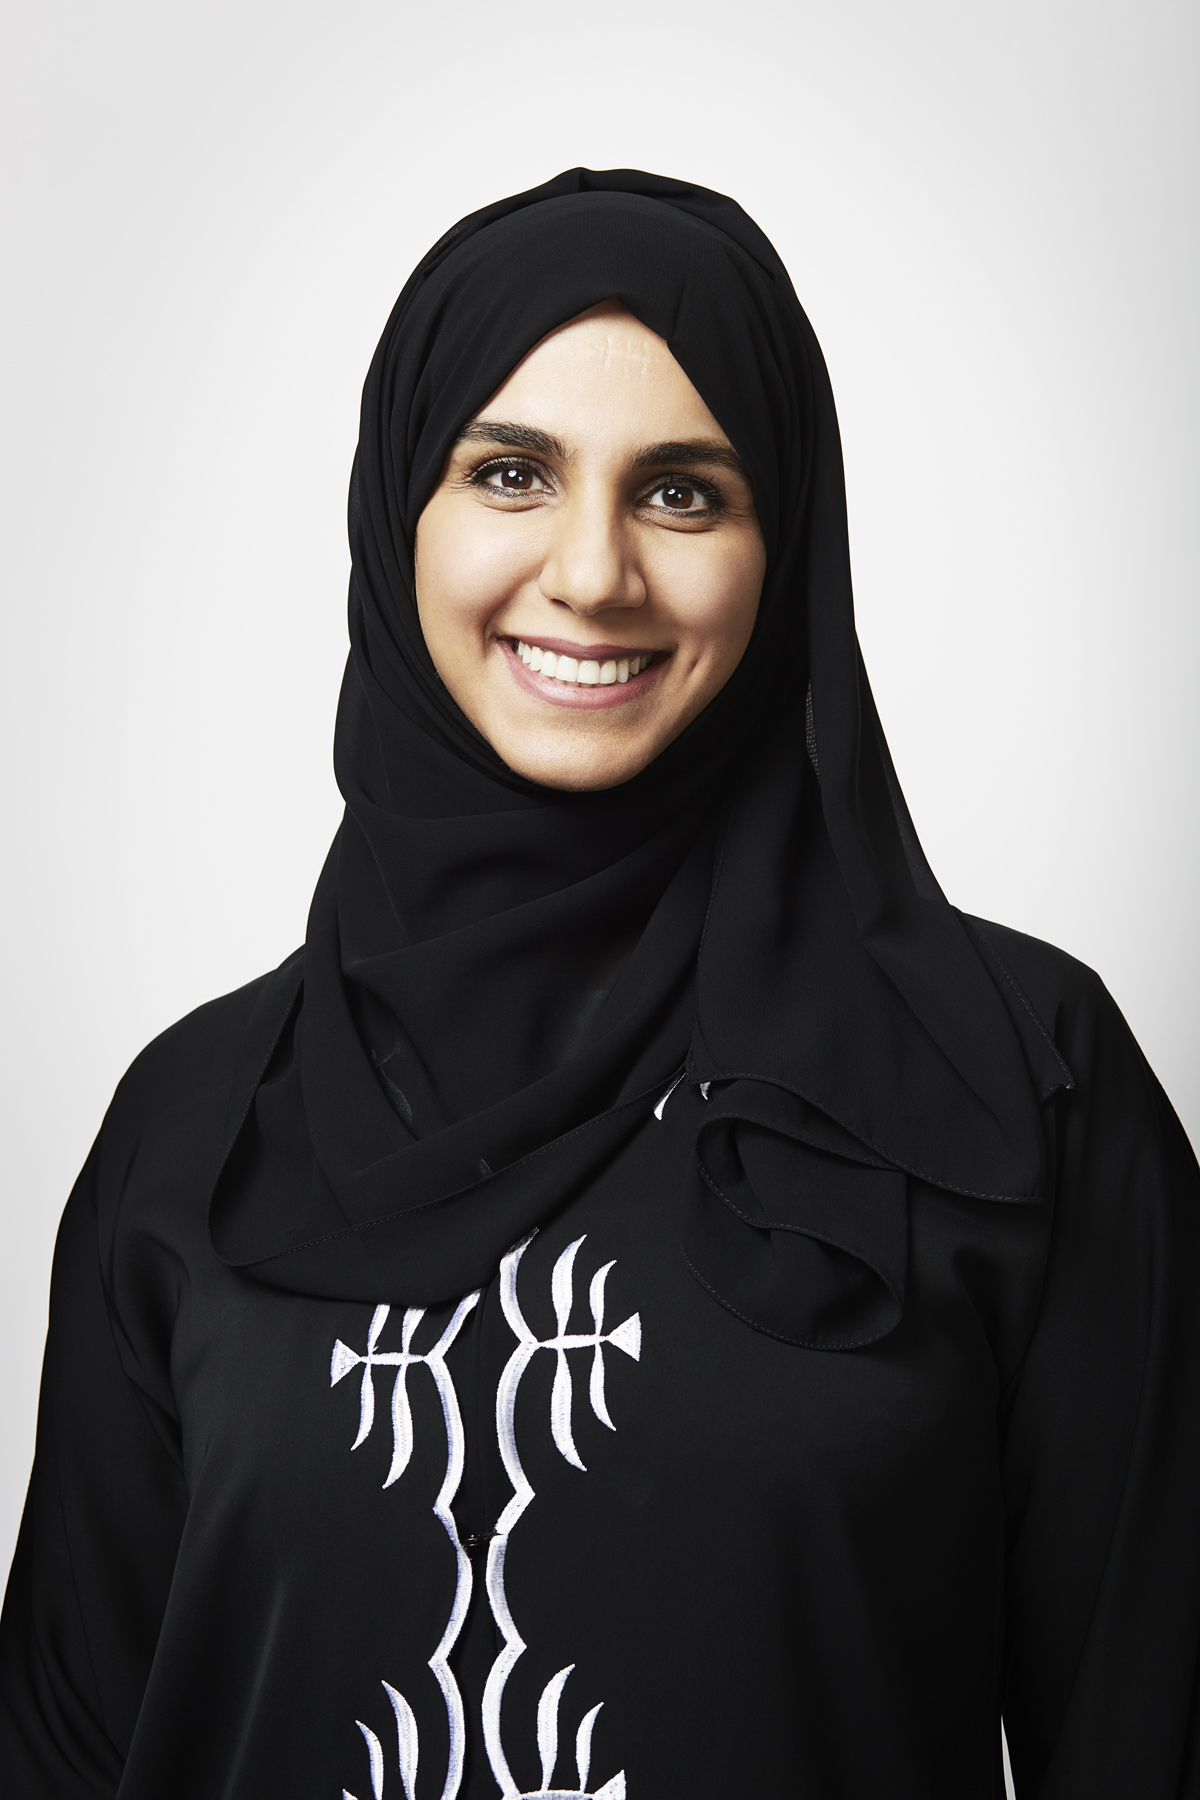 RanaldMackechnie.ADNOC Emirati Women's Day11.jpg